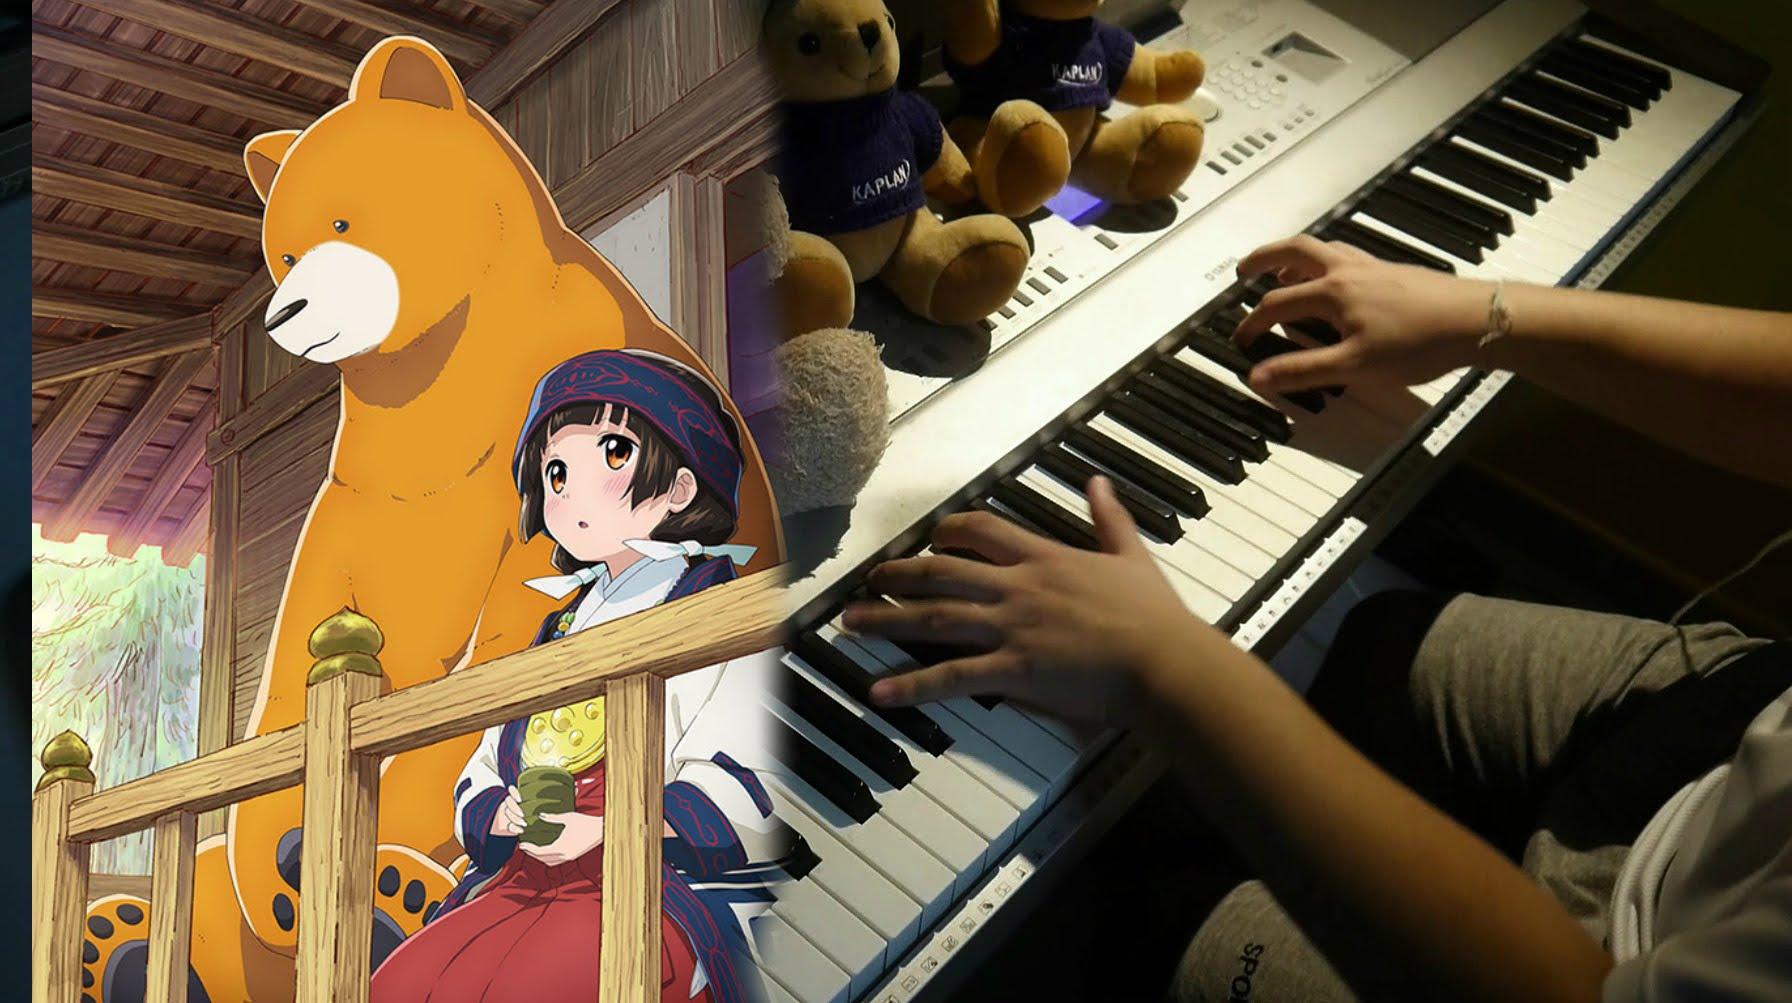 Kuma Miko Girl Meets Bear Wallpapers Anime Hq Kuma Miko Girl Images, Photos, Reviews